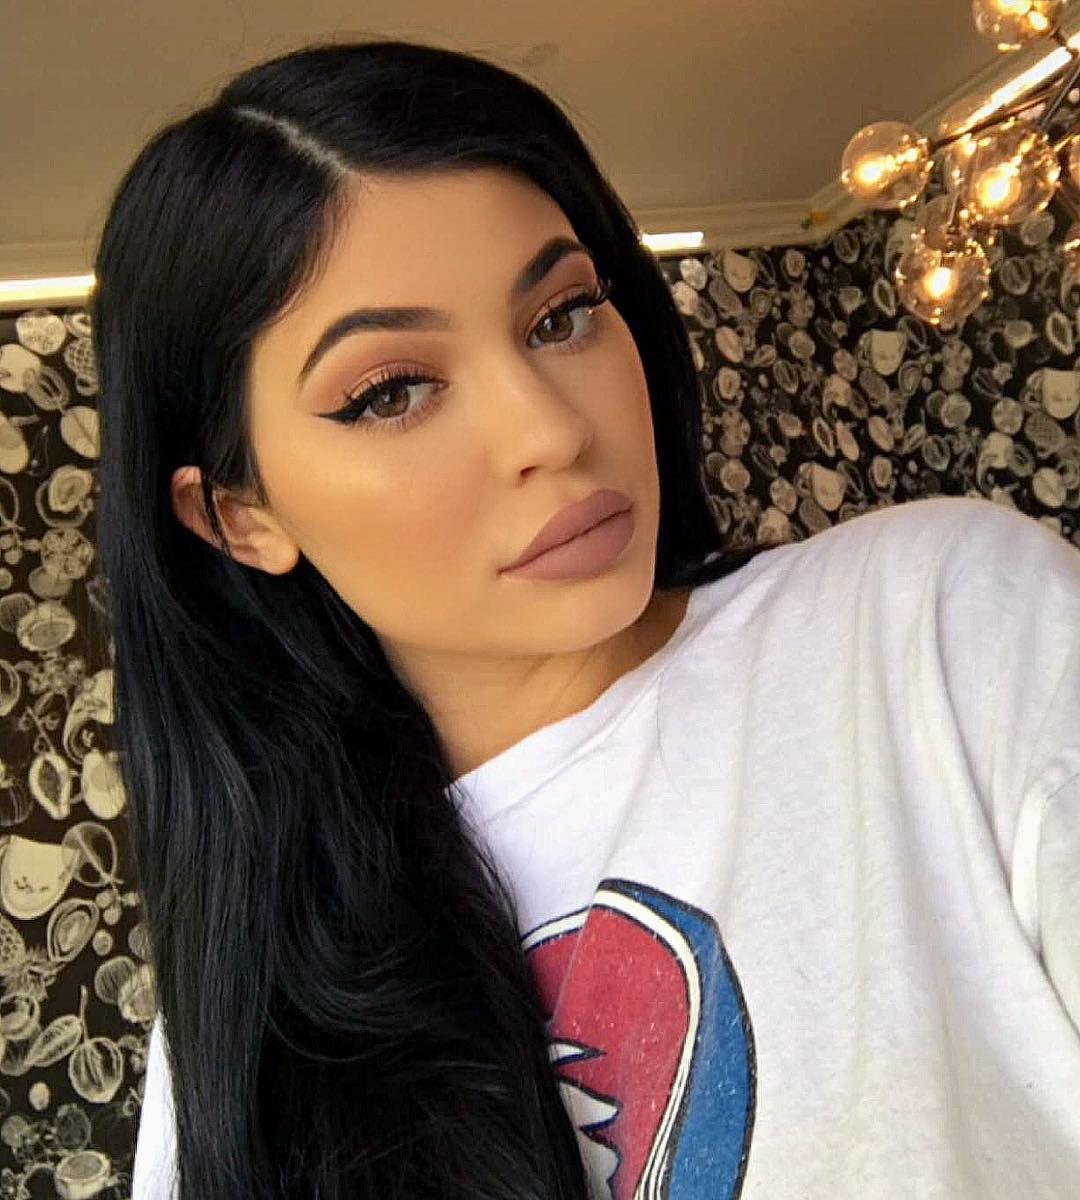 Pin by Corina G. on Makeup looks   Kylie jenner makeup